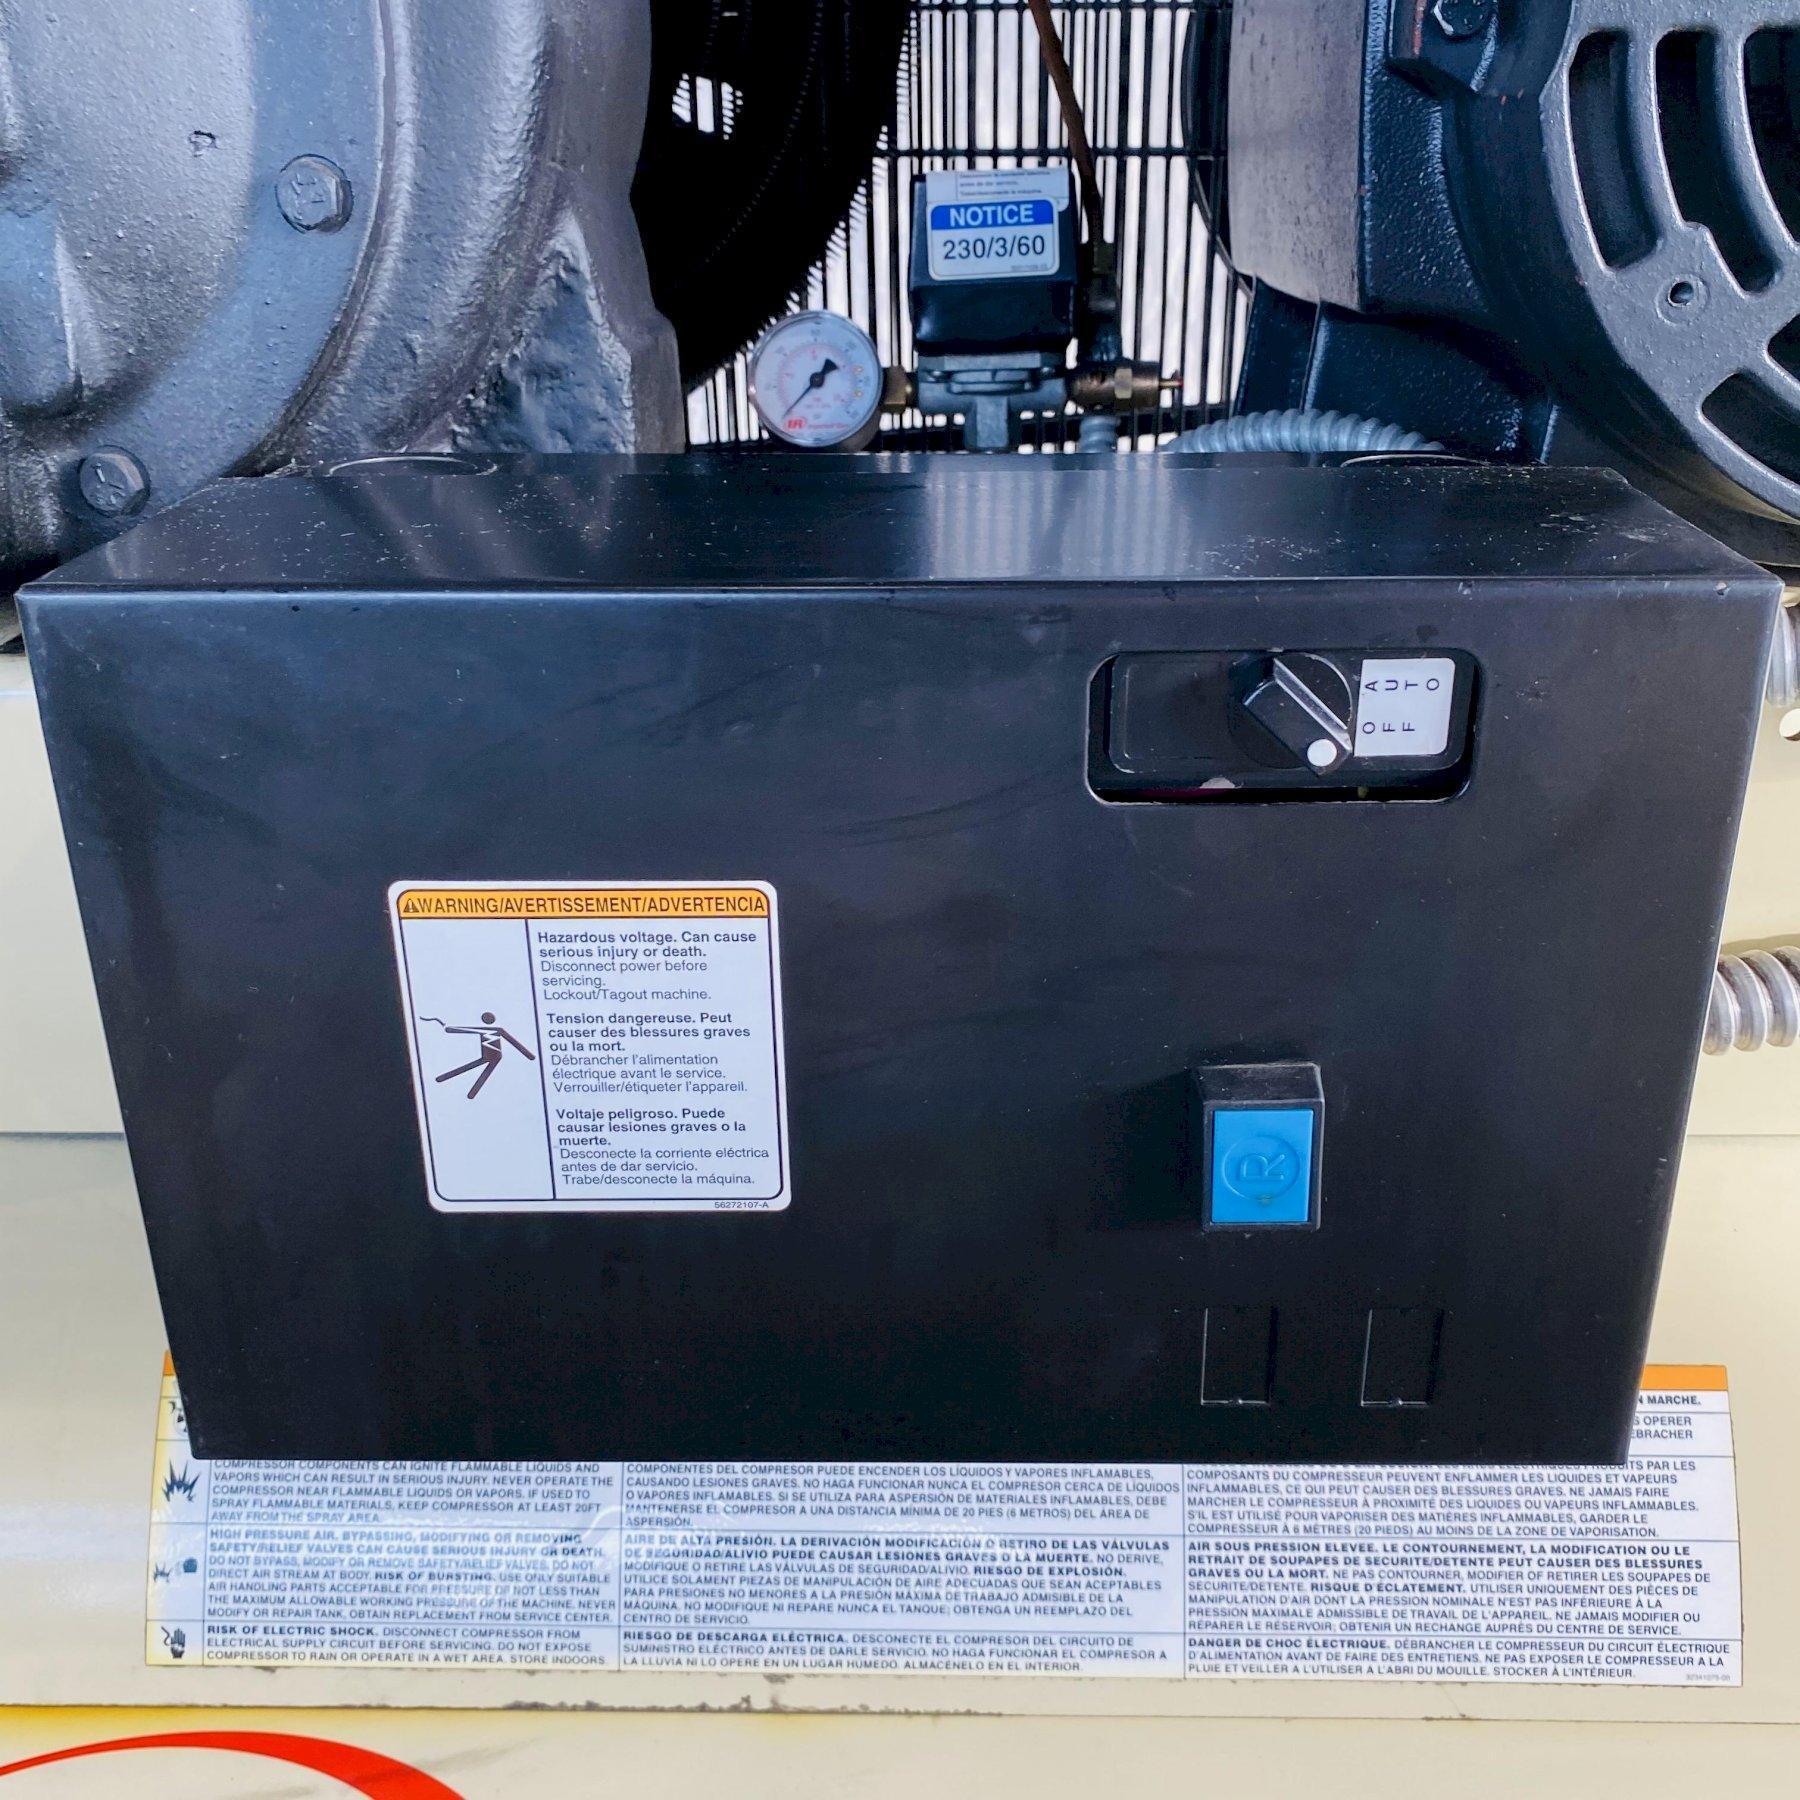 15 HP INGERSOLL-RAND 7100E15-V HORIZONTAL PISTON TYPE AIR COMPRESSOR. STOCK # 0631321